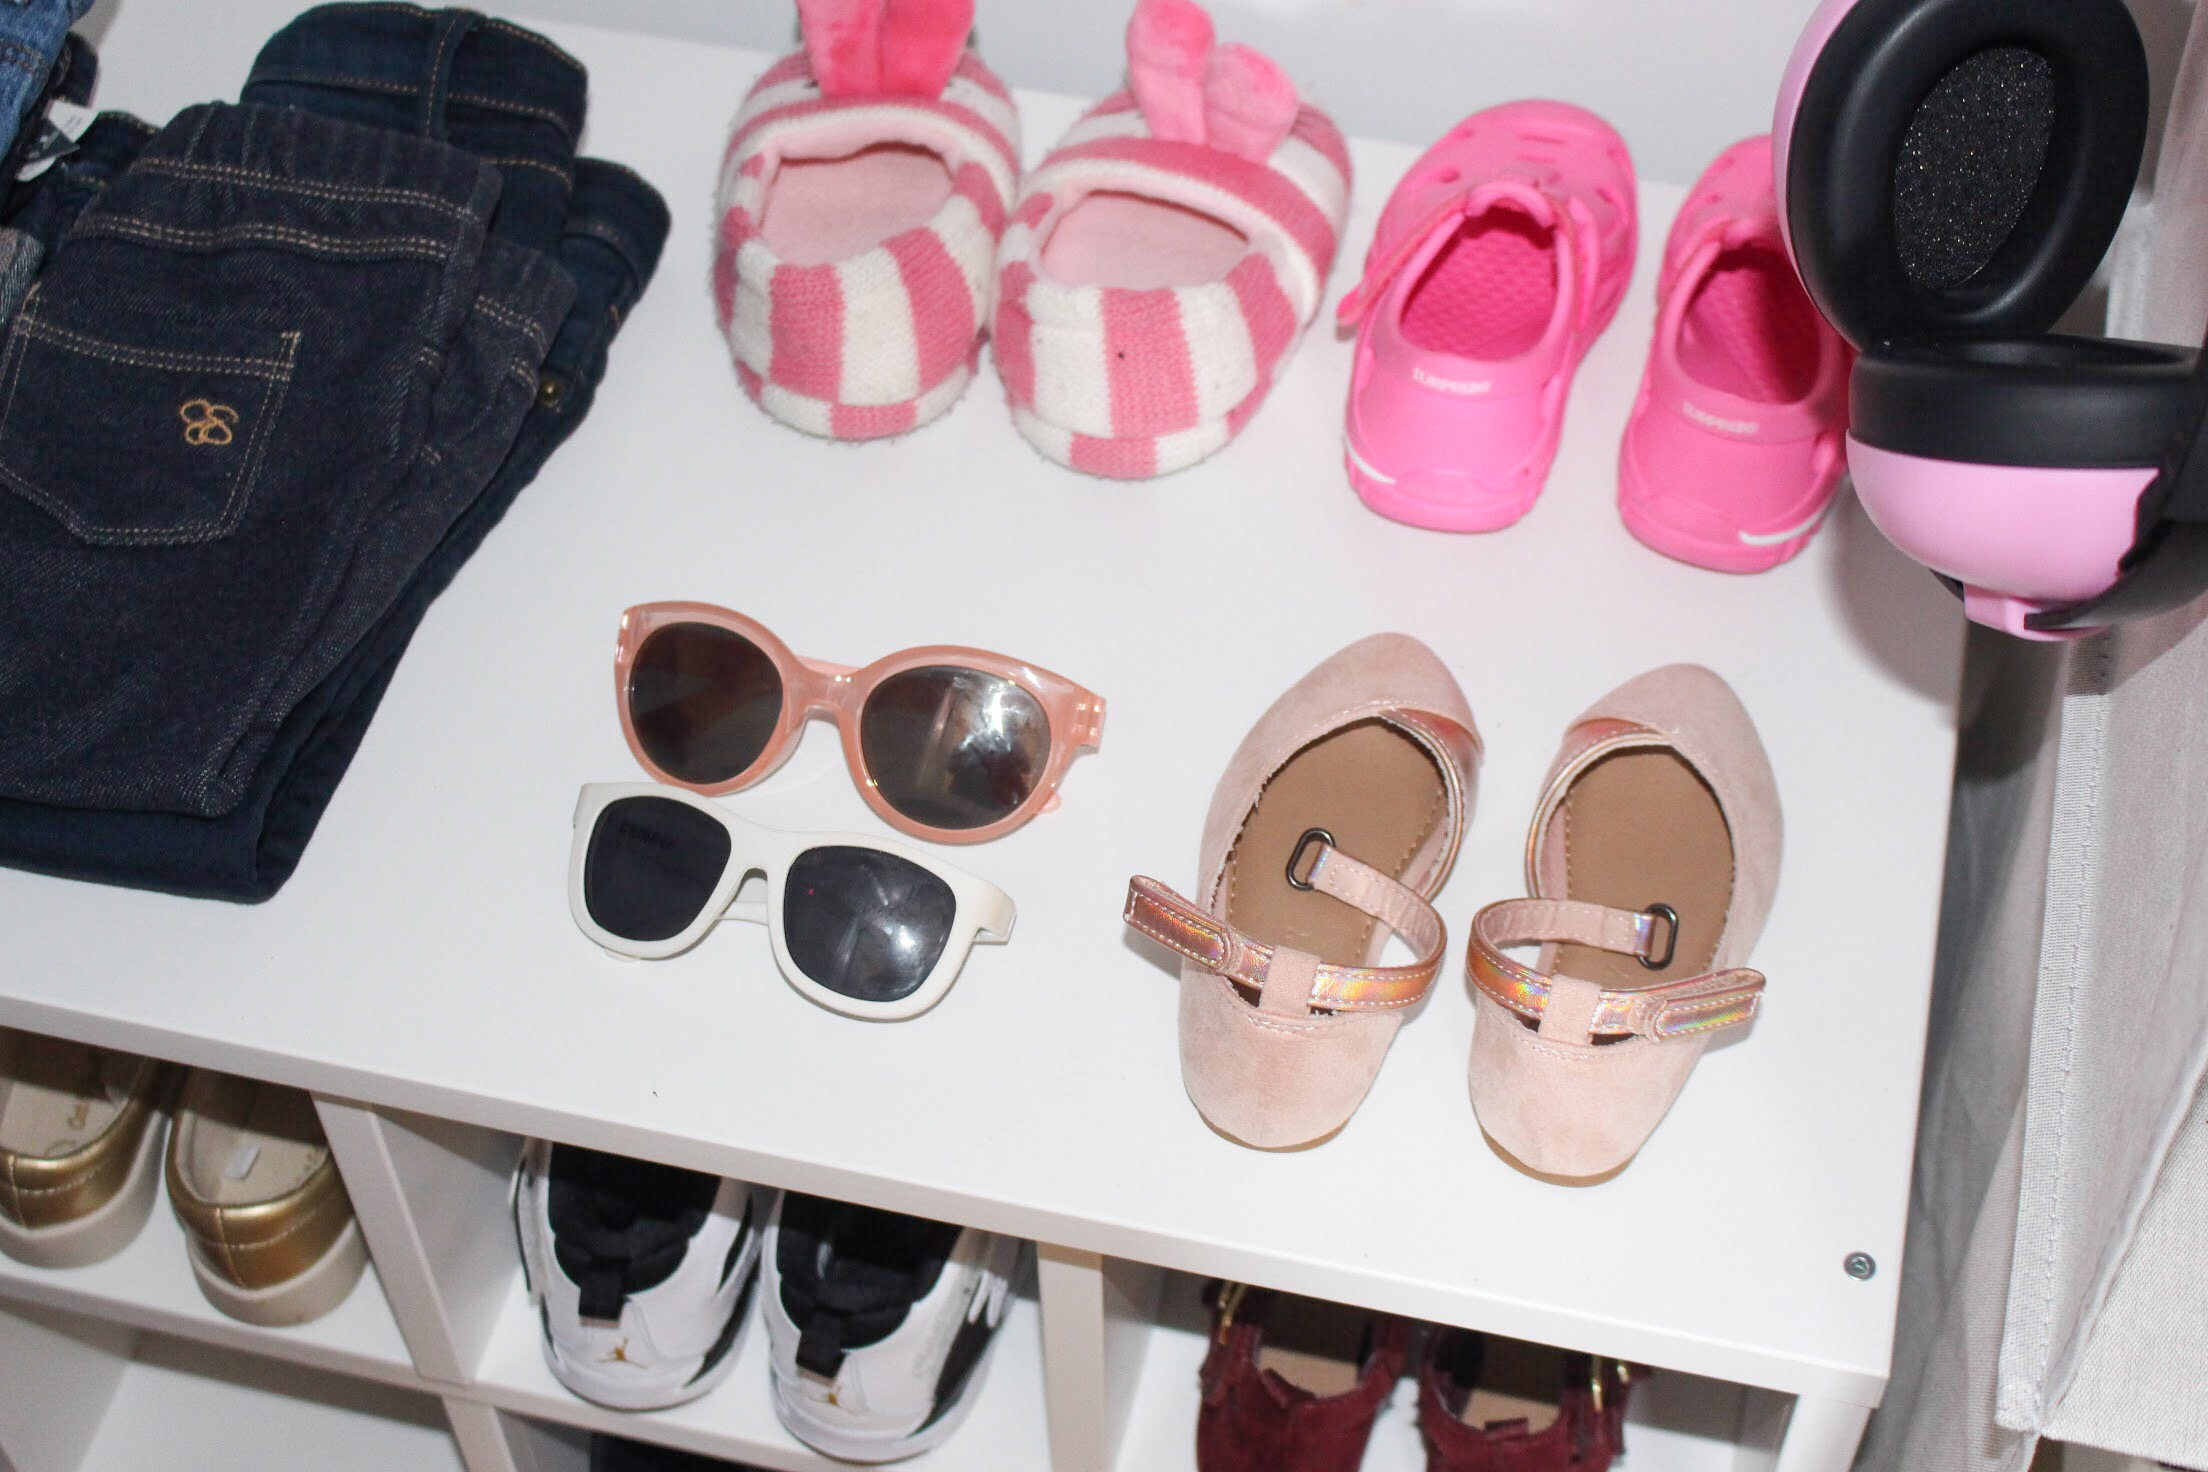 Toddler Closet Organization - Shoes | Pish Posh Perfect